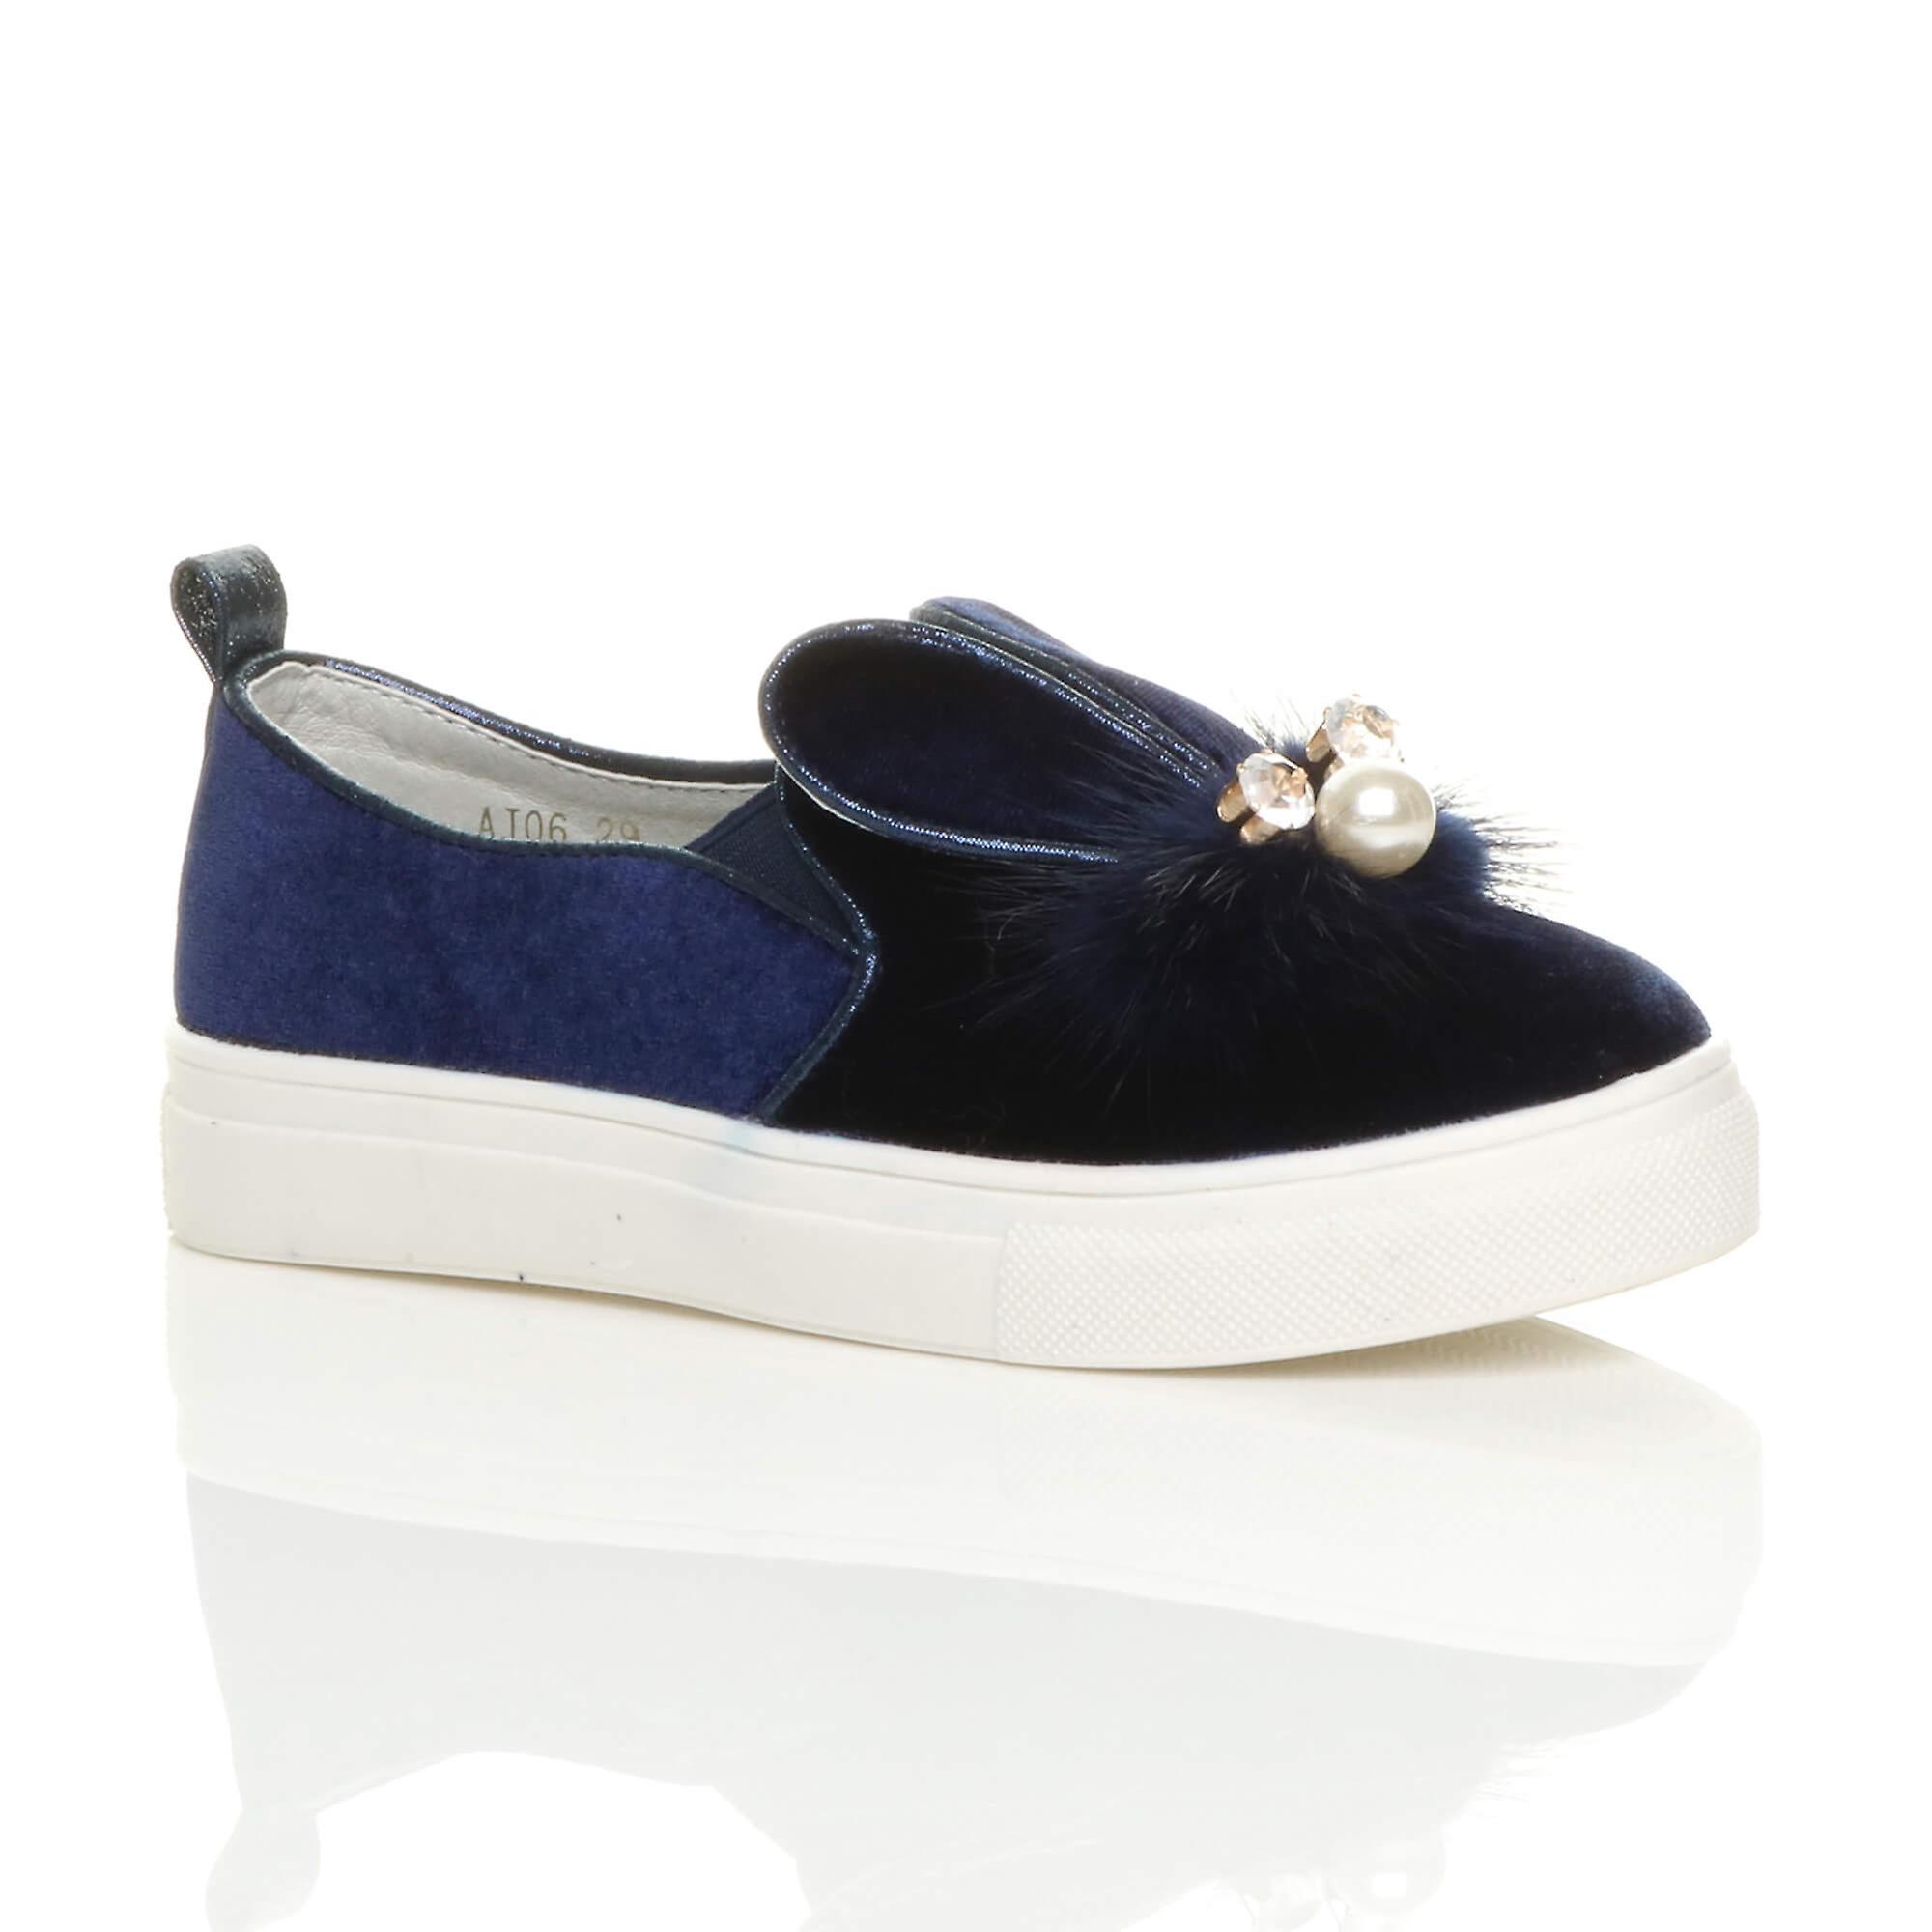 Ajvani girls flat gem diamante fur velvet bunny ears slip on pumps shoes plimsolls trainers